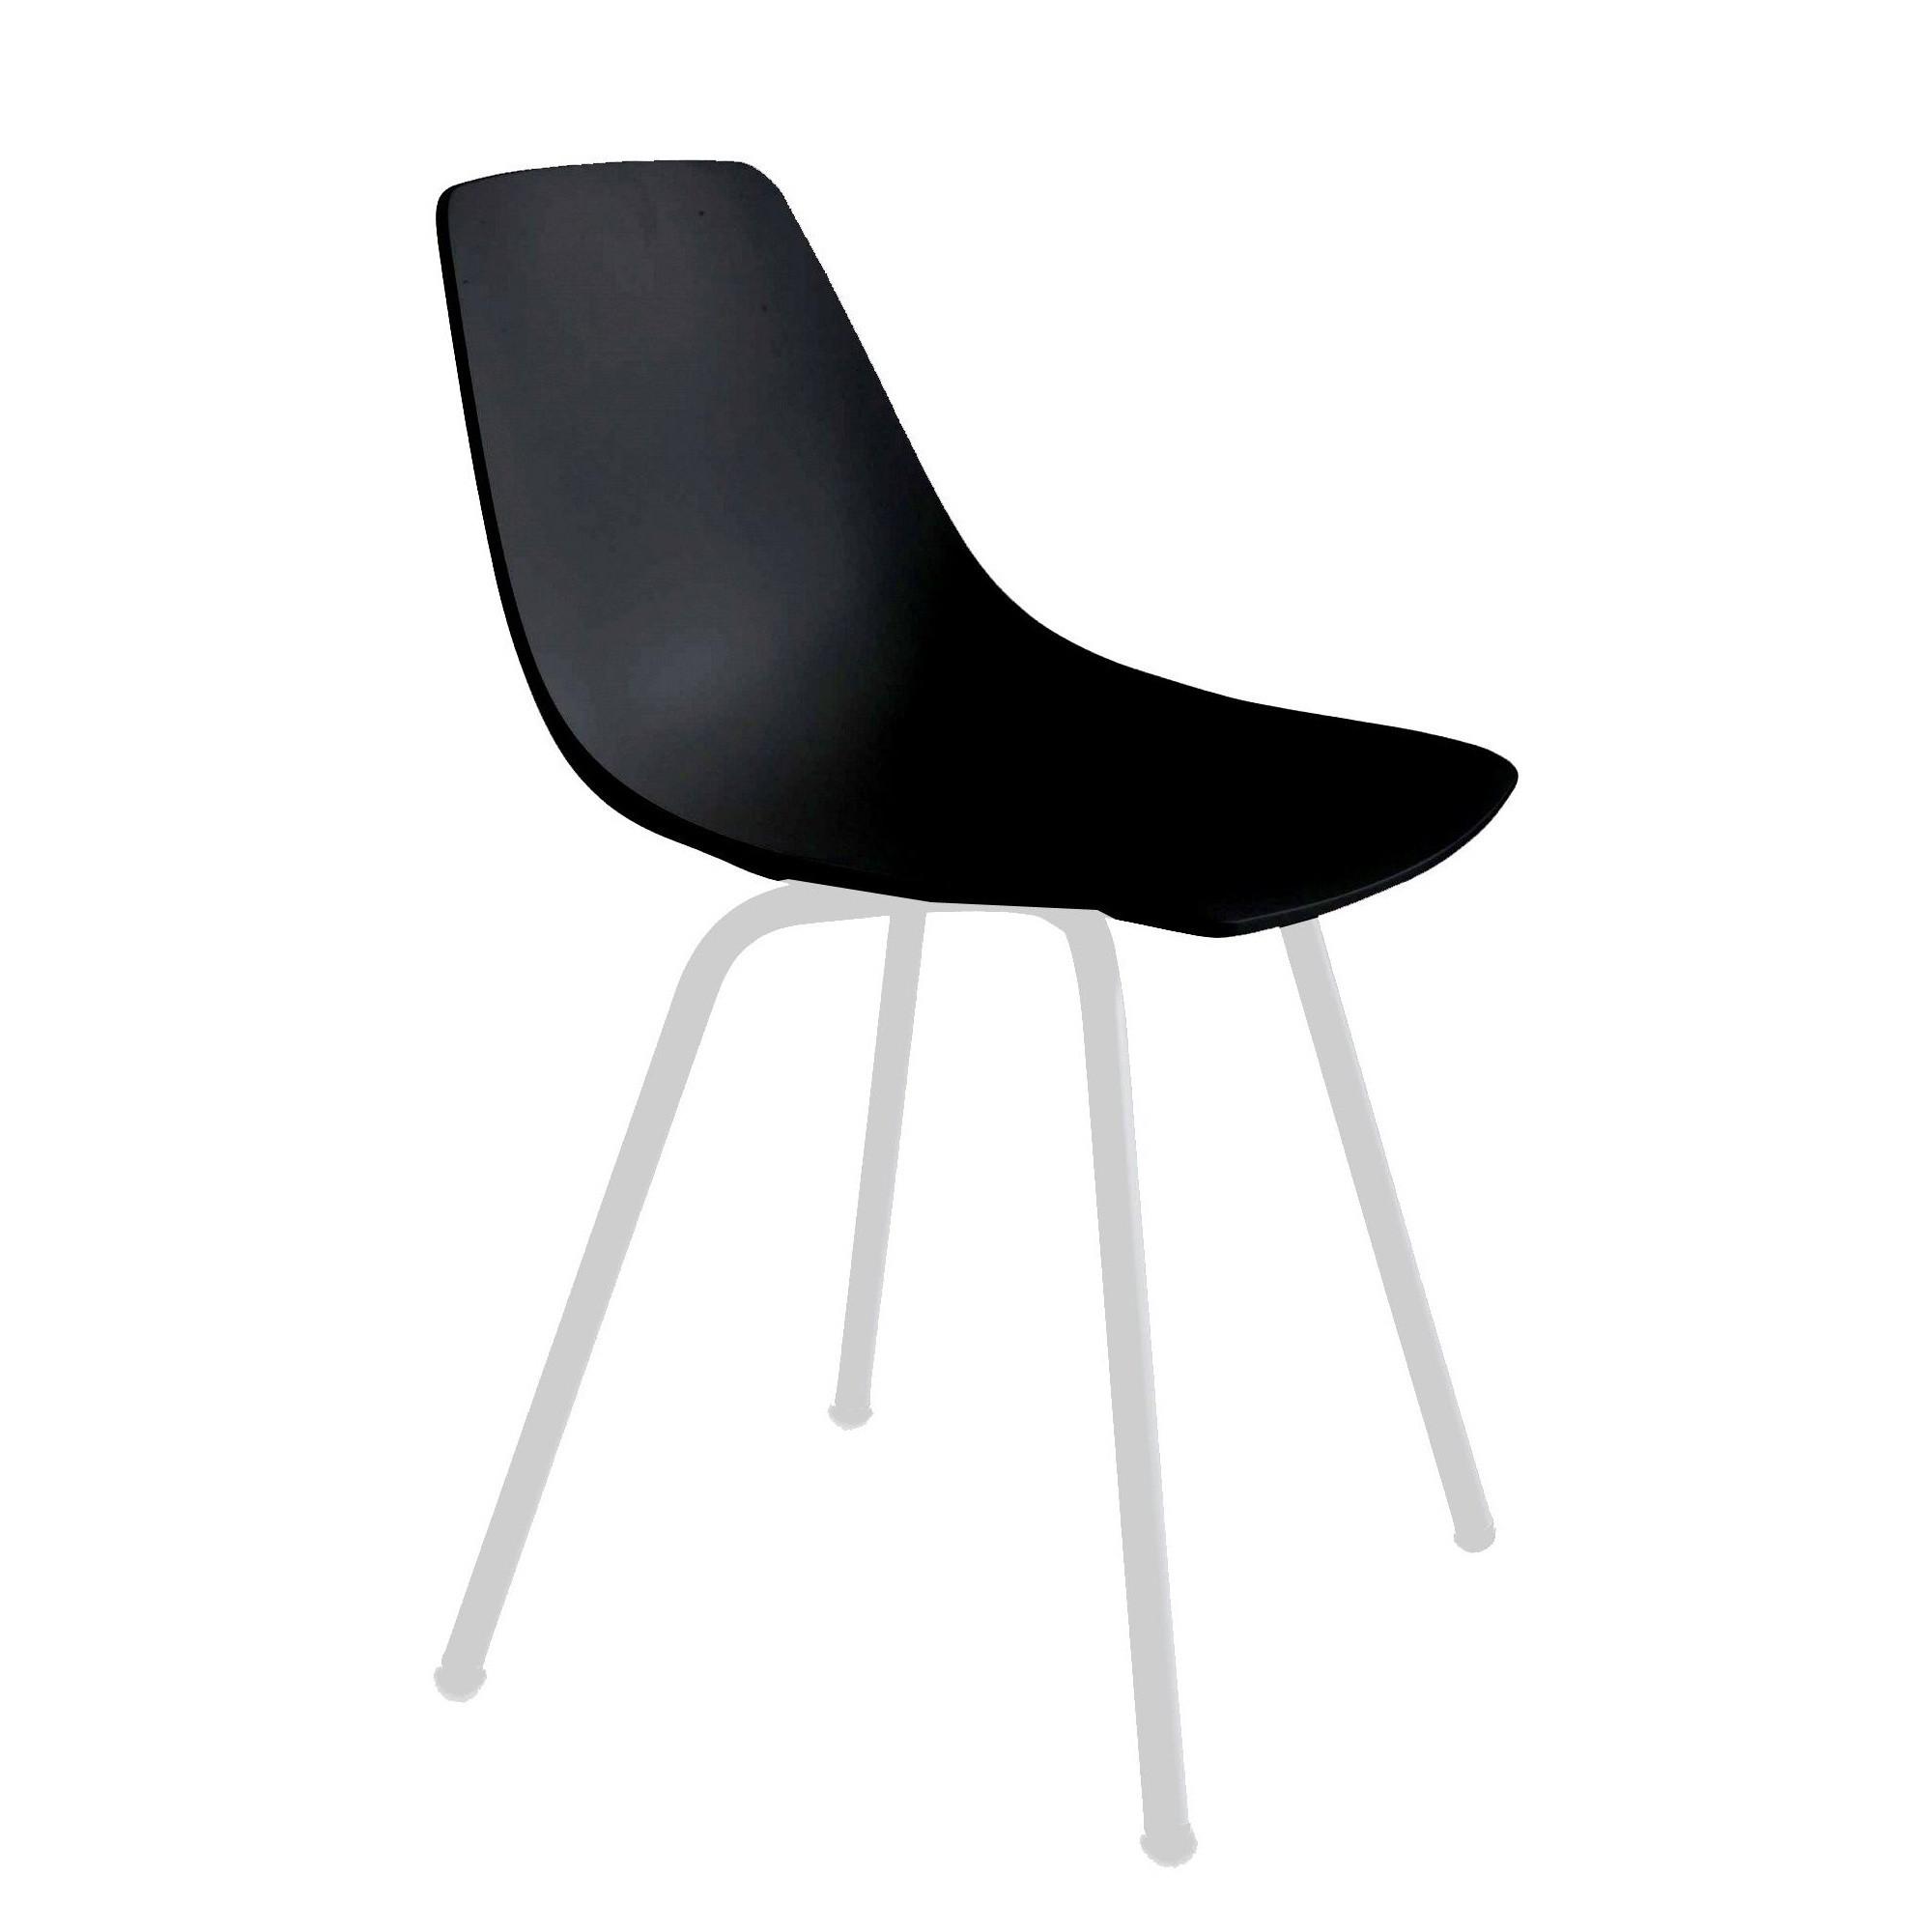 ... La Palma   Miunn Chair Frame White   Black Stained Open Pored/frame  White ...